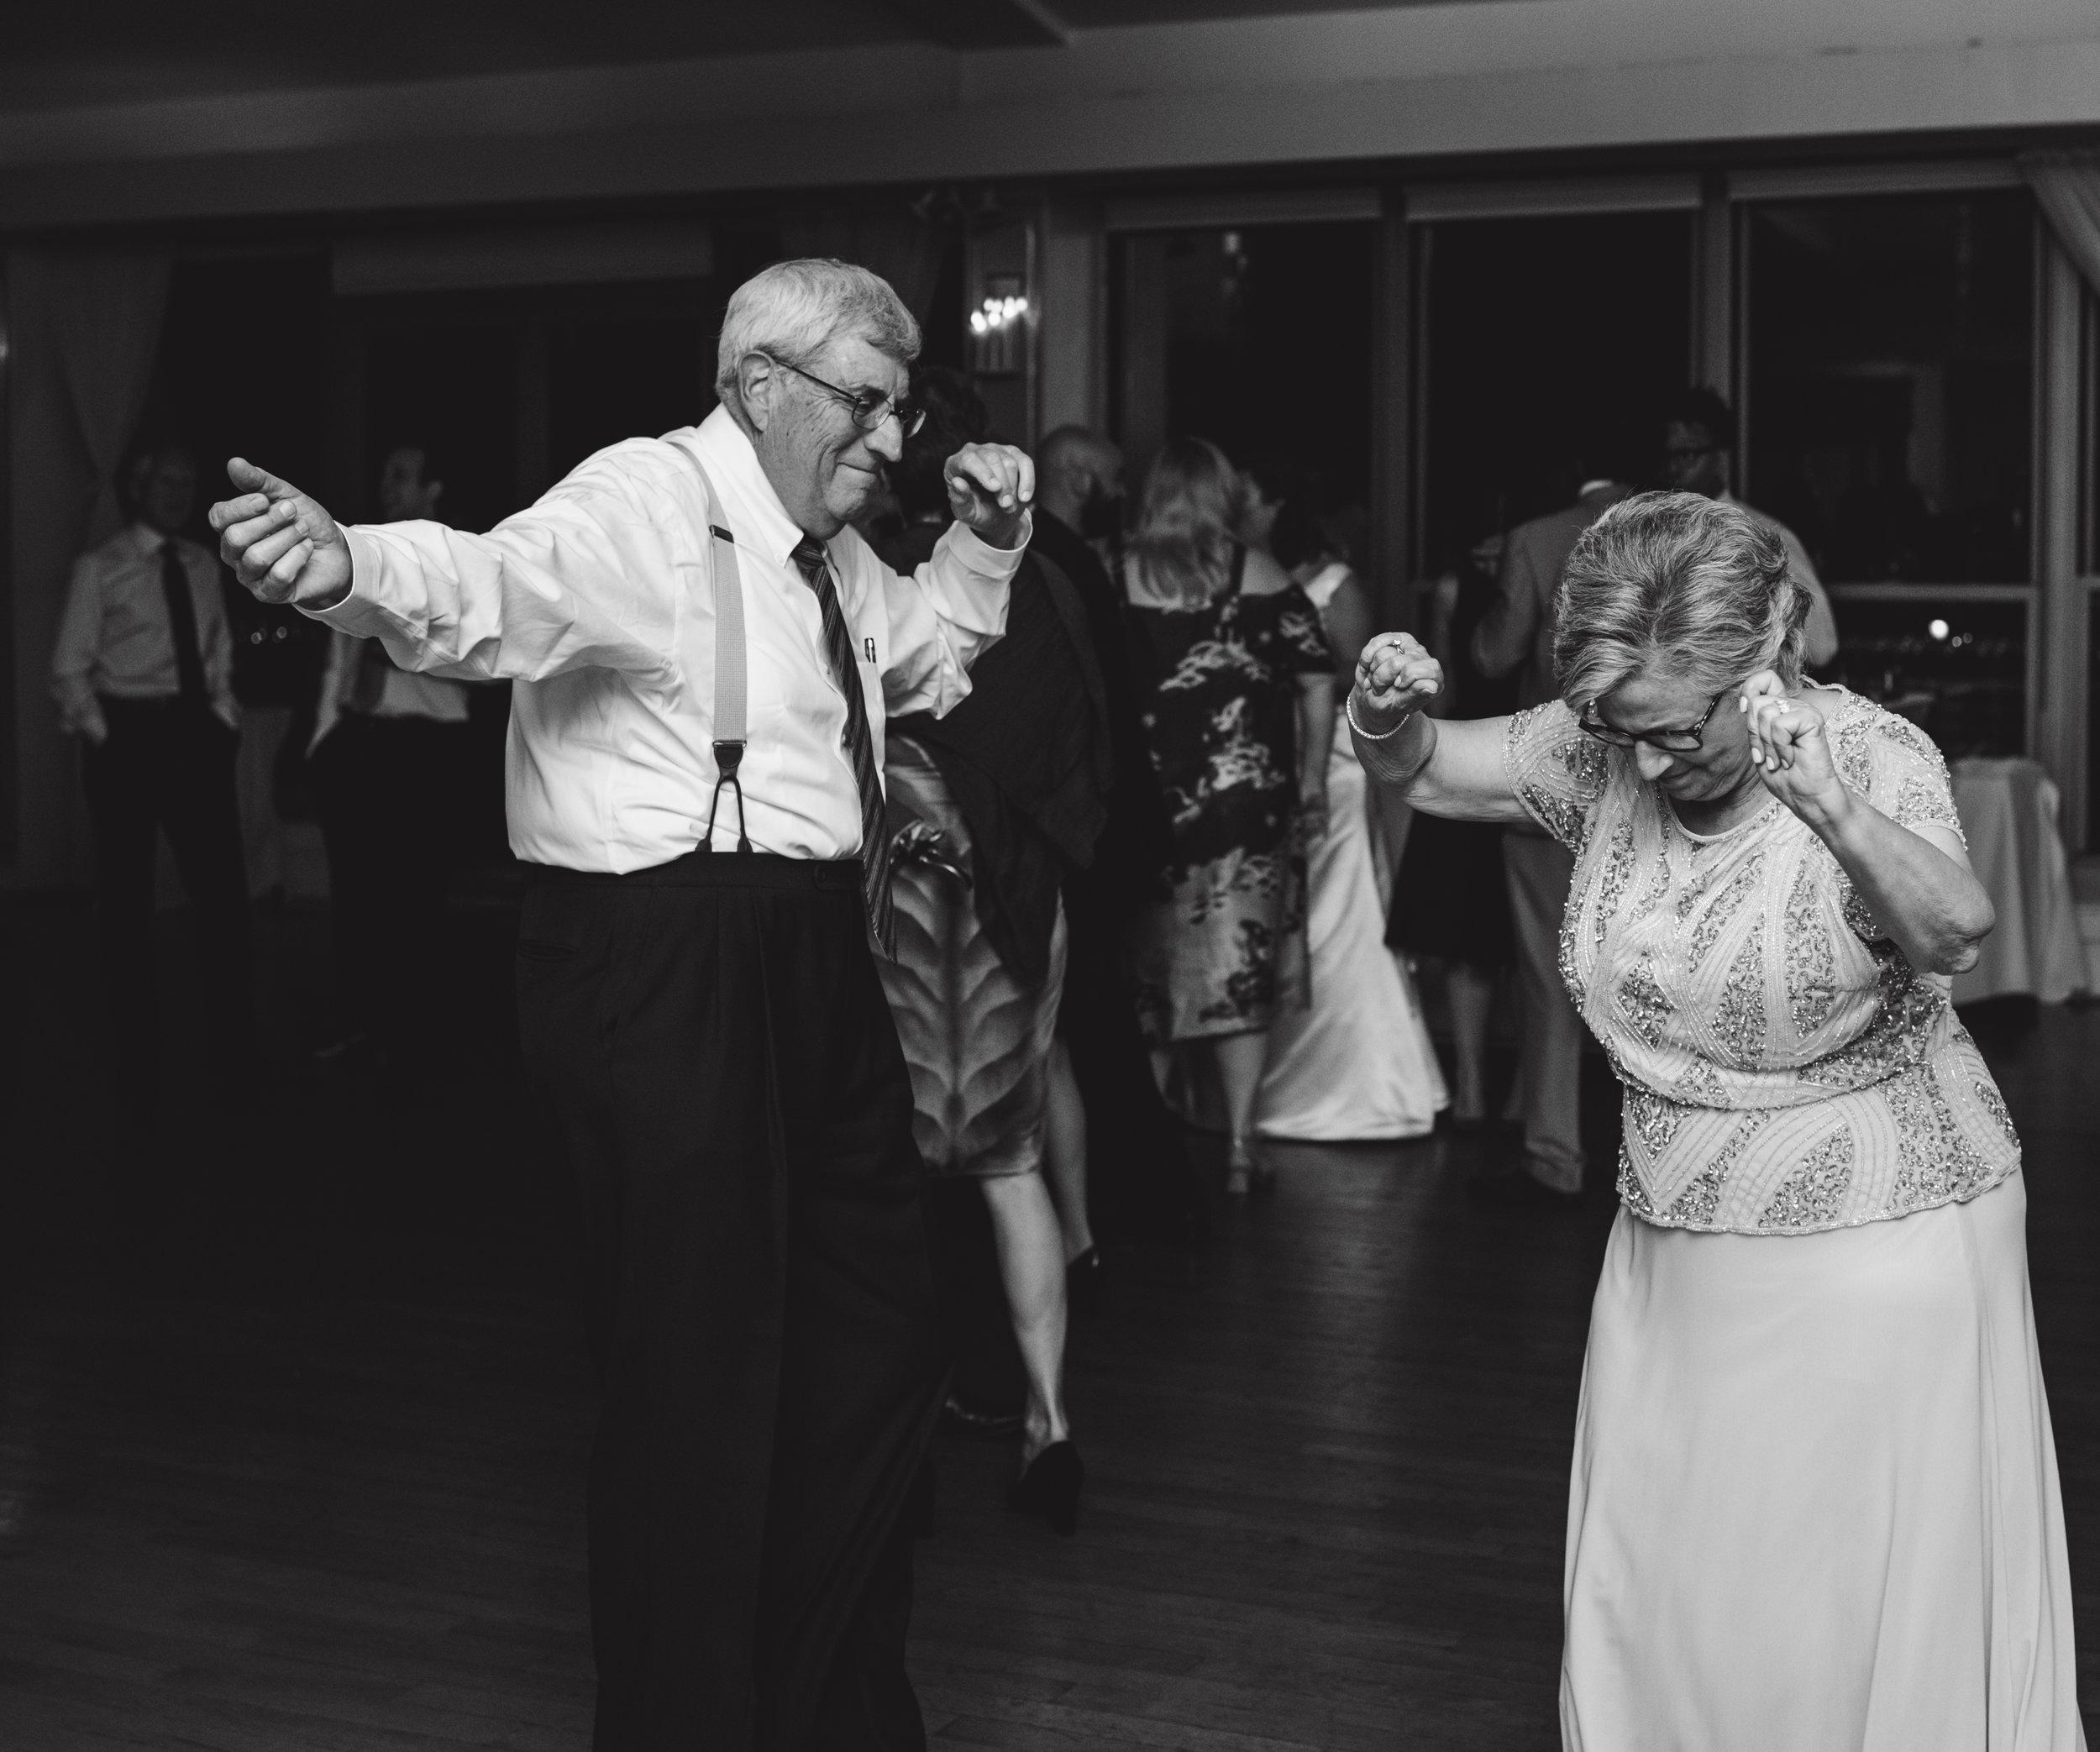 LIZA & JON - BATTERY PARK WEDDING - NYC INTIMATE WEDDING PHOTOGRAPHER - CHI-CHI AGBIM-790.jpg